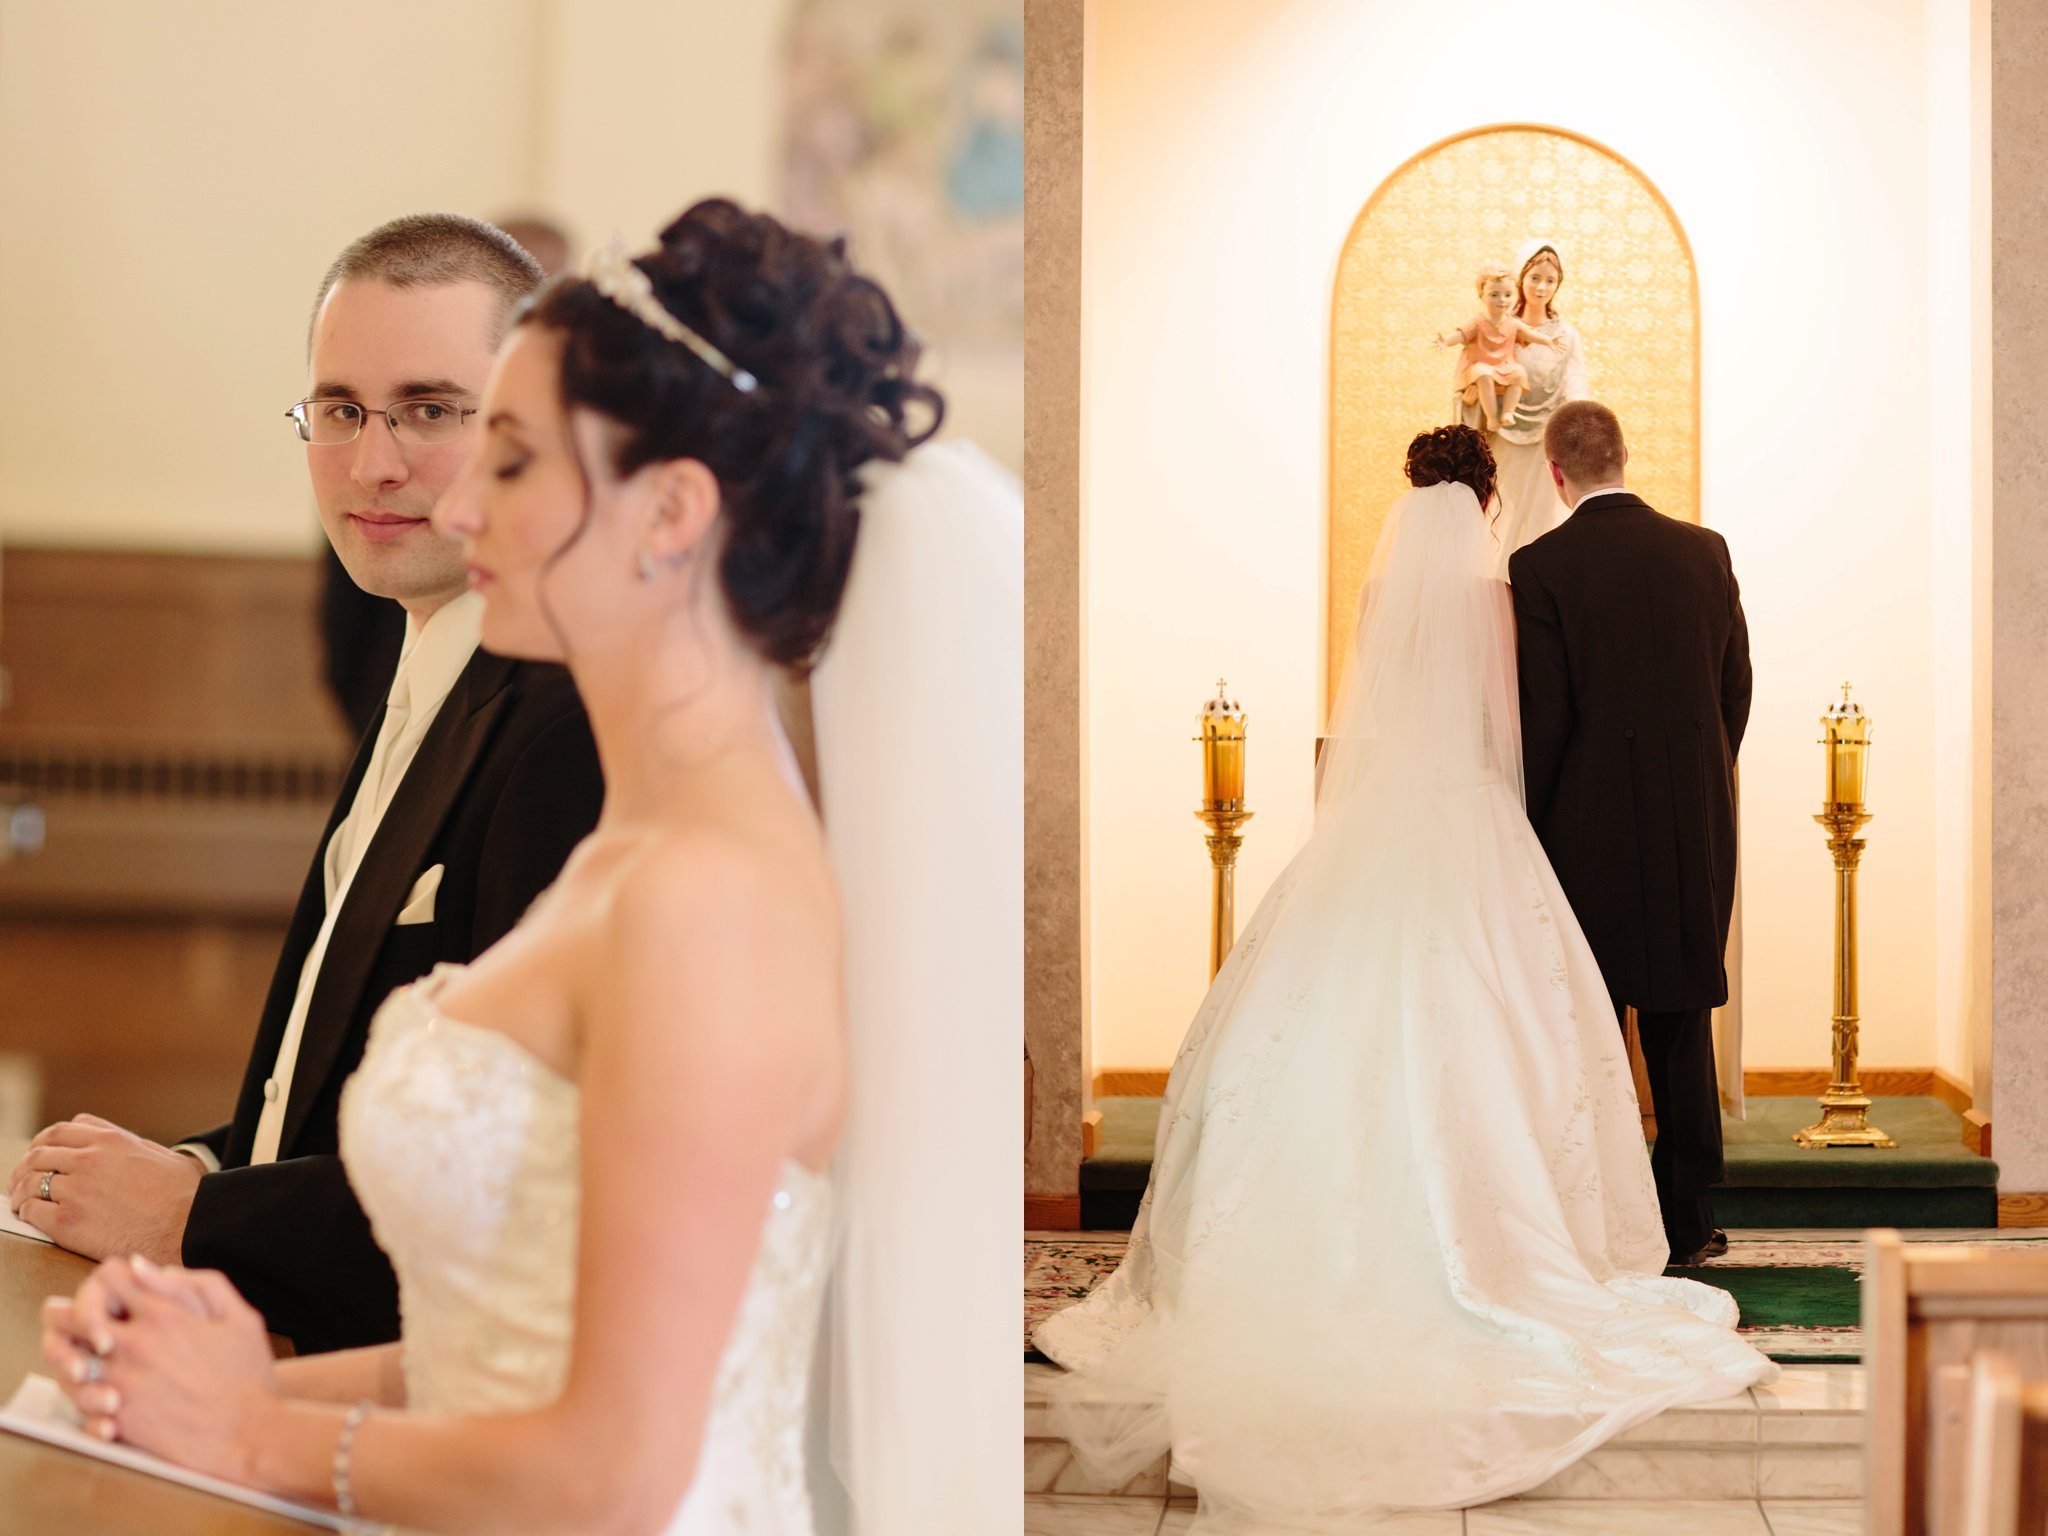 genettis_wilkes_barre_wedding_photos_9224.jpg